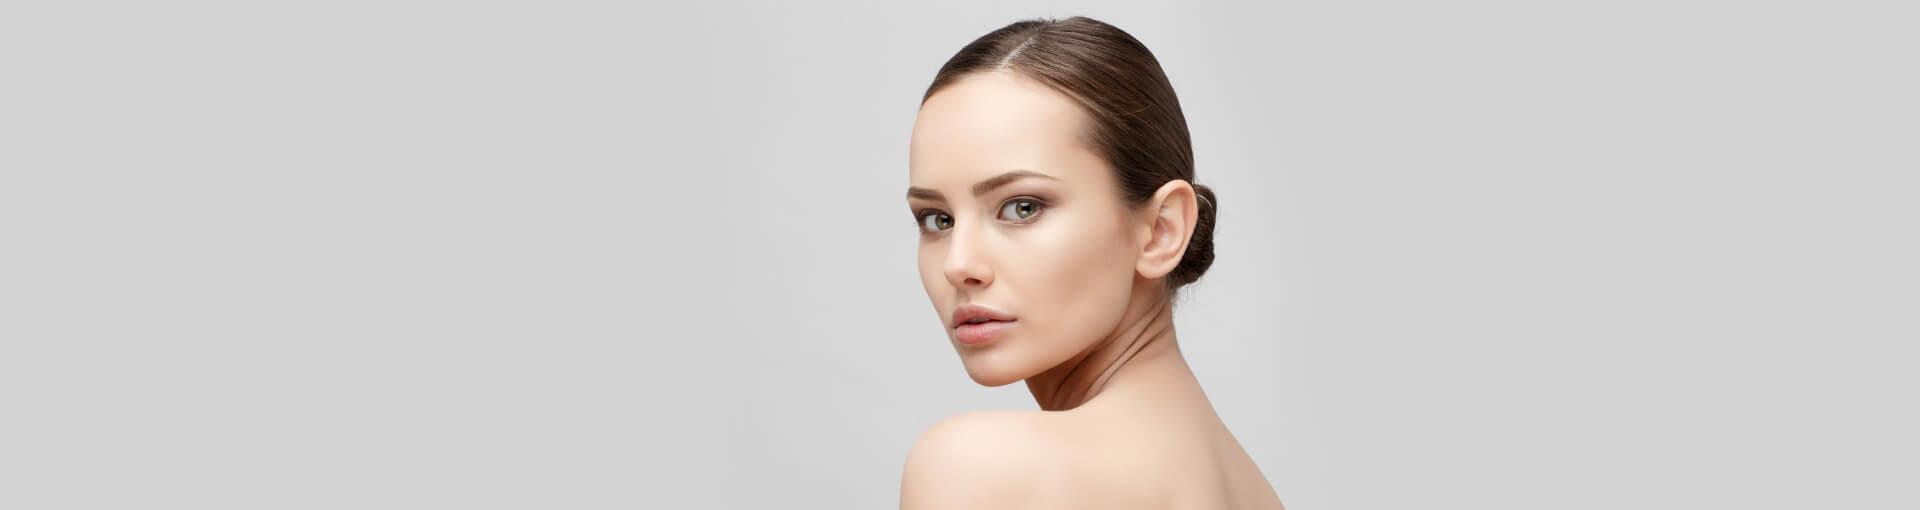 Laser Genesis - drs skin care